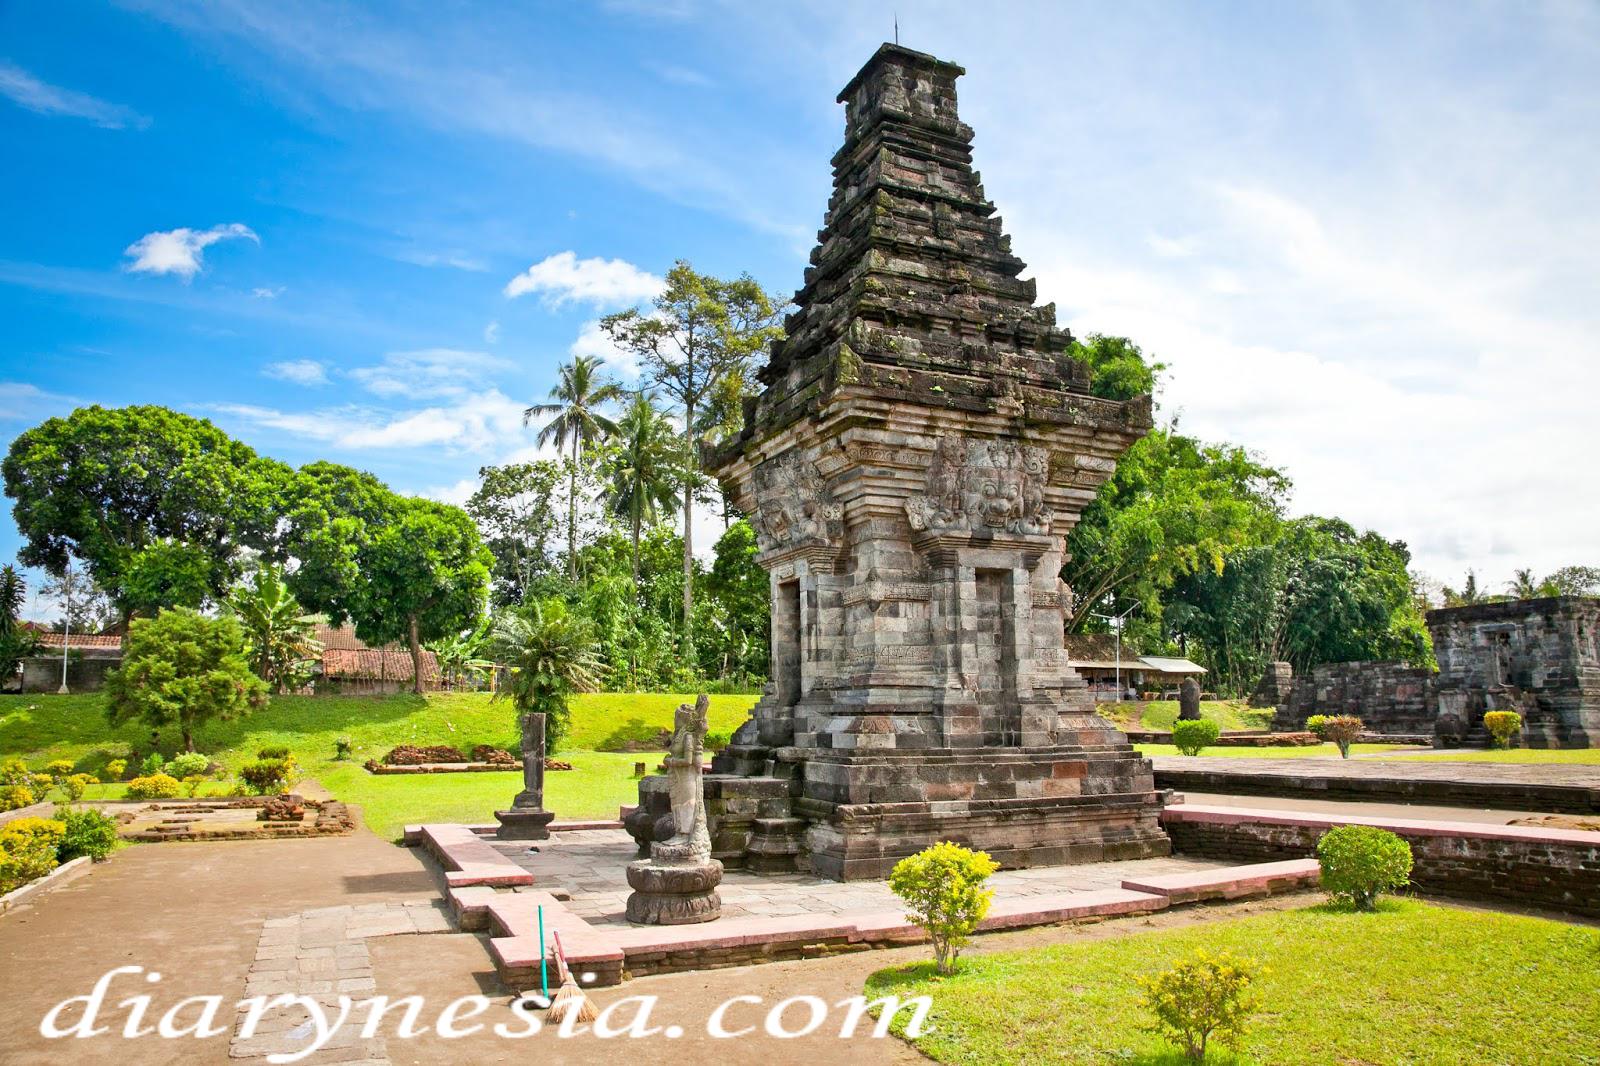 Destination in kediri, Tourist spot Jawa Timur, Majapahit Kingdom, diarynesia